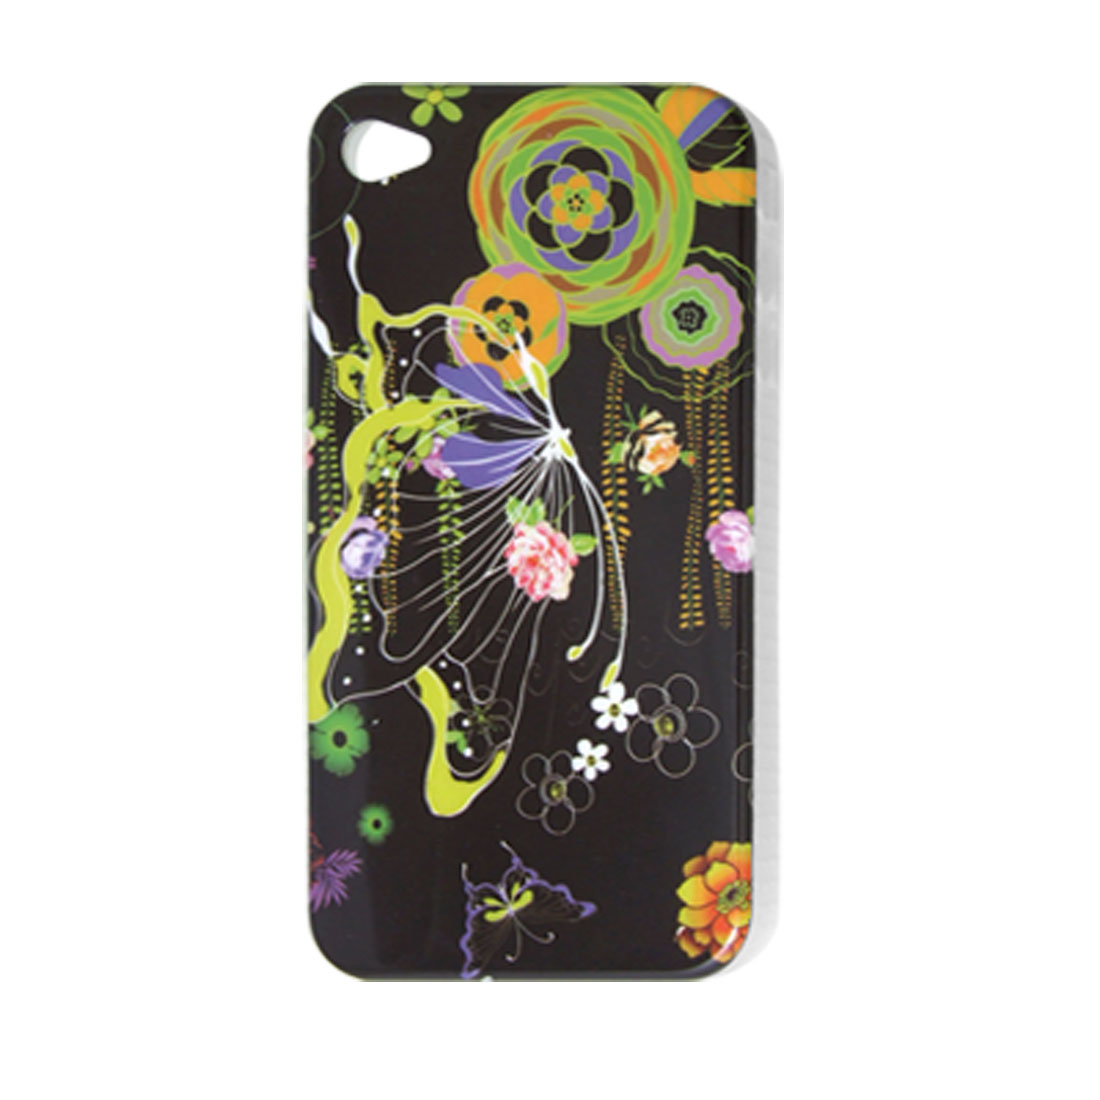 Flower Butterfly Print IMD Hard Plastic Back Case for iPhone 4 4G